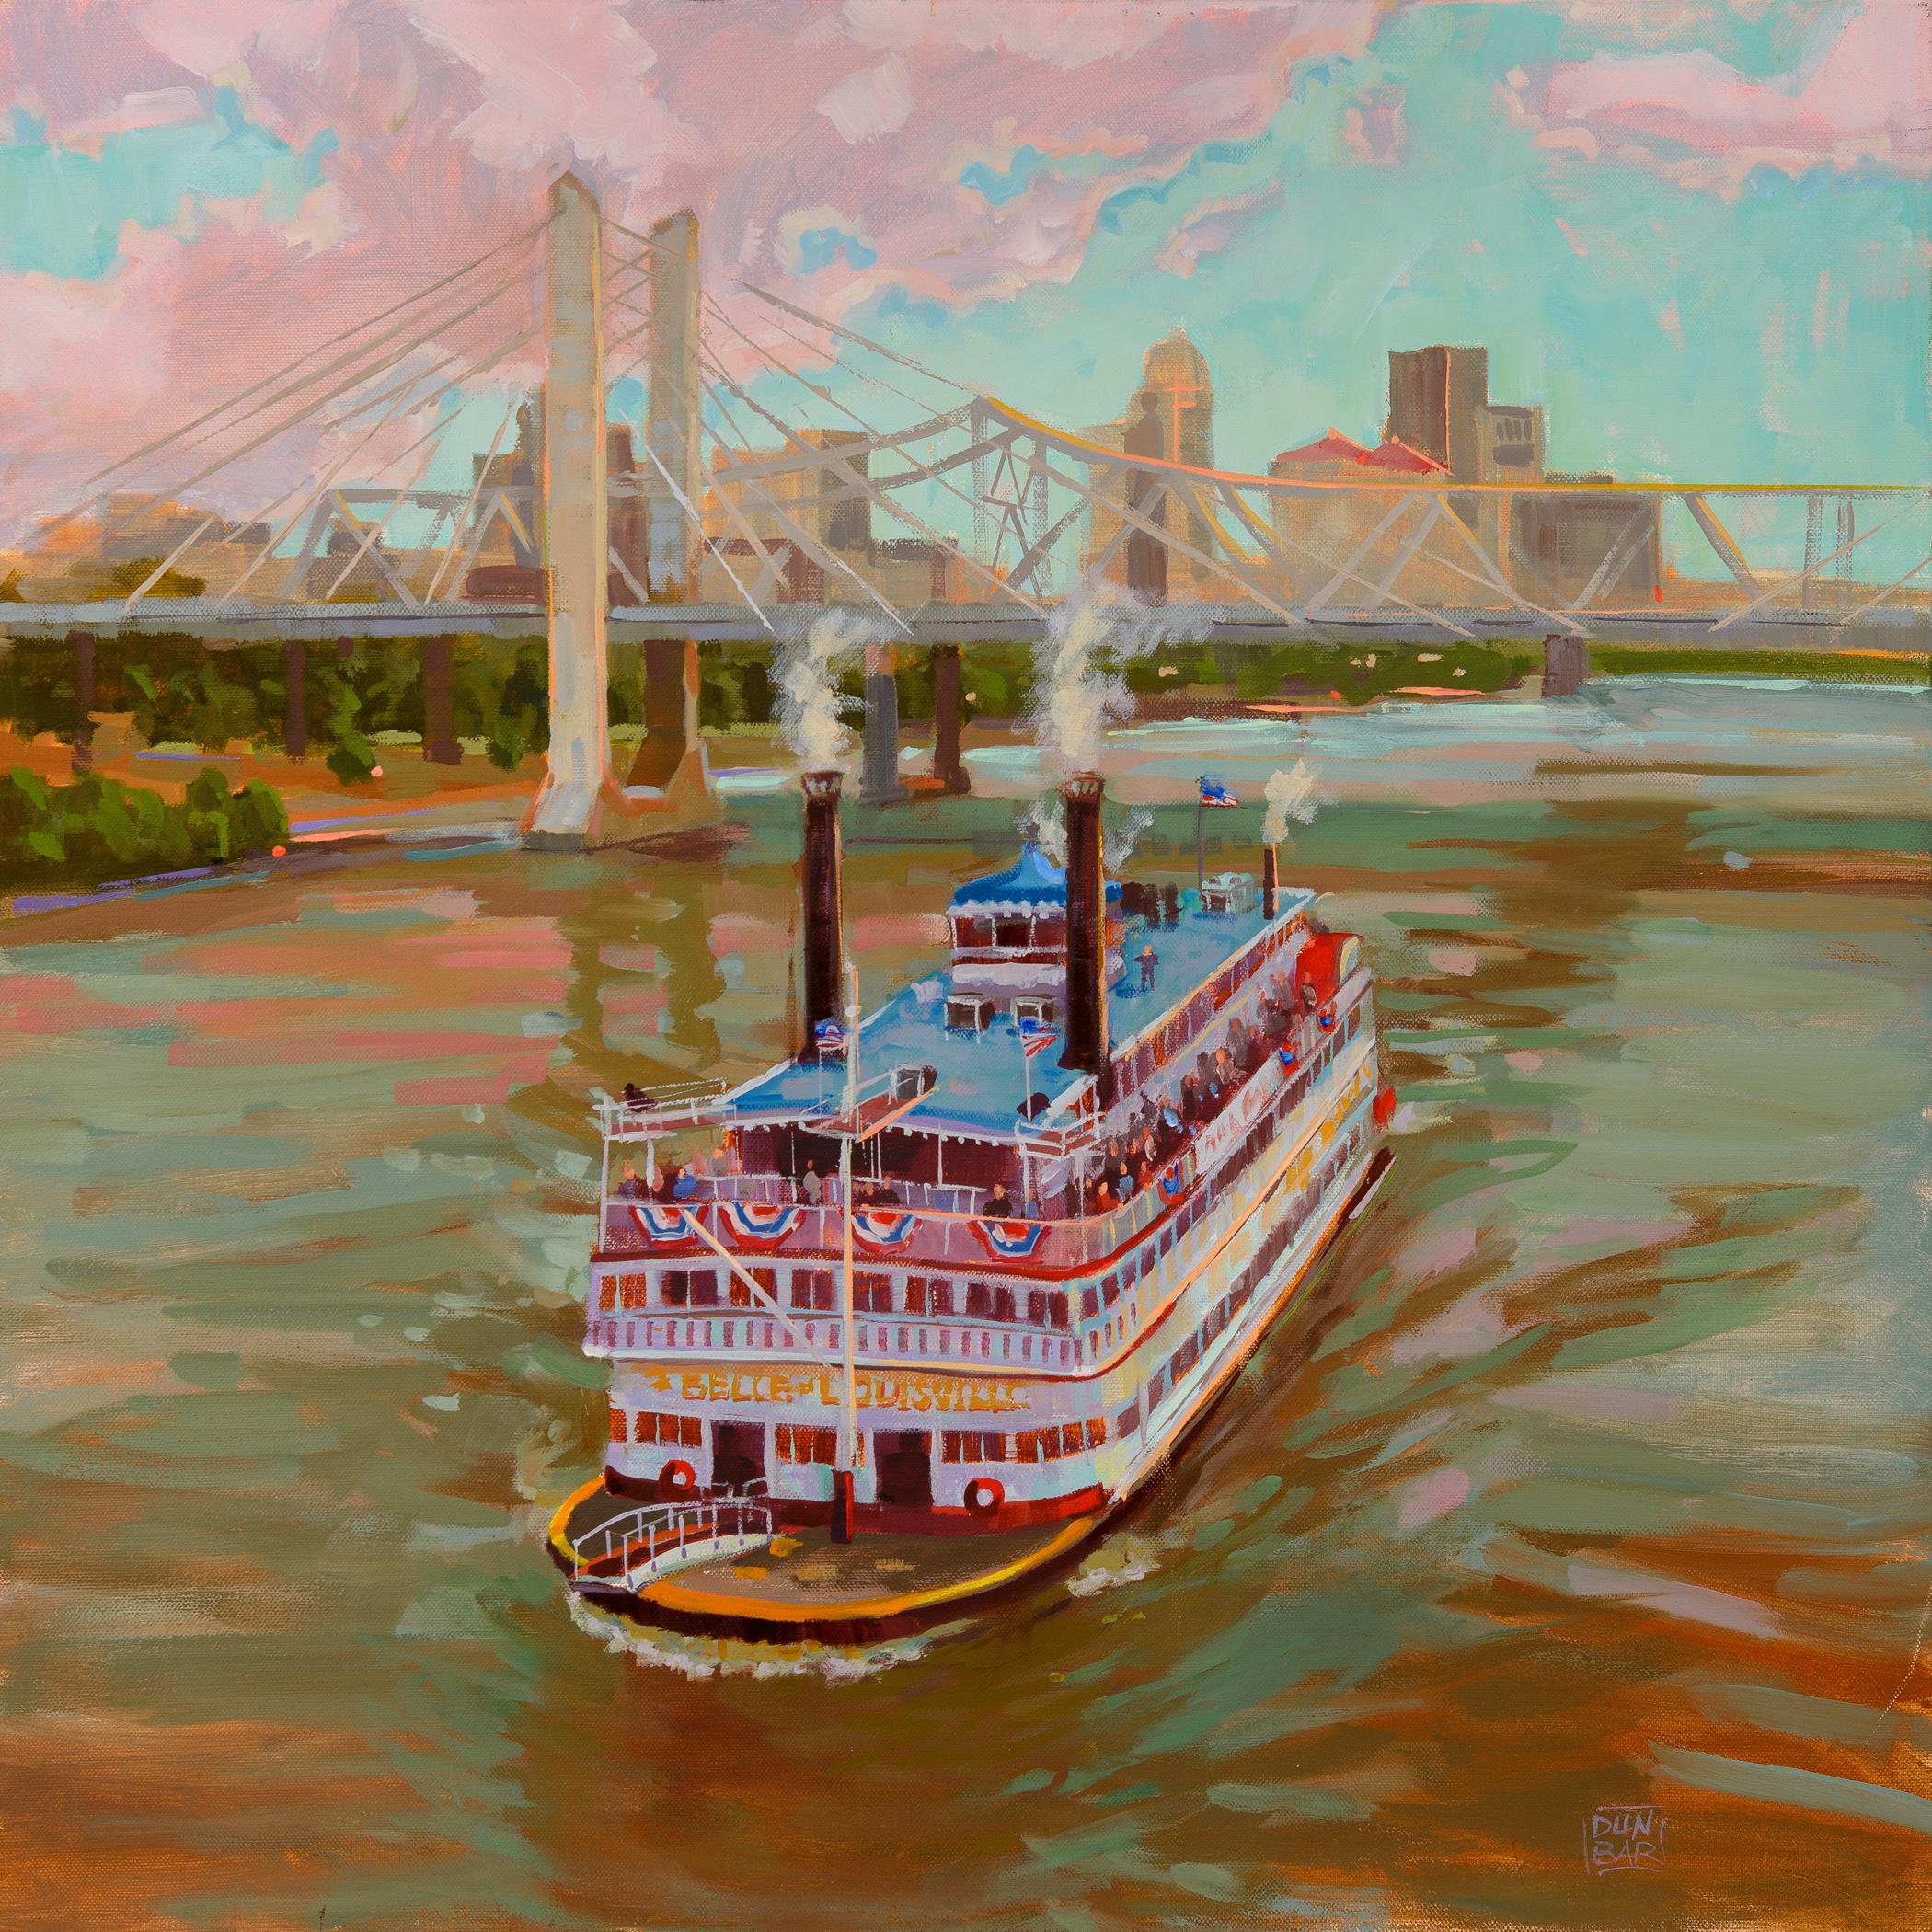 """Belle and Lincoln Bridge"" by Lynn Dunbar Bayus, Oil canvas paint, 18x18in, $1200"